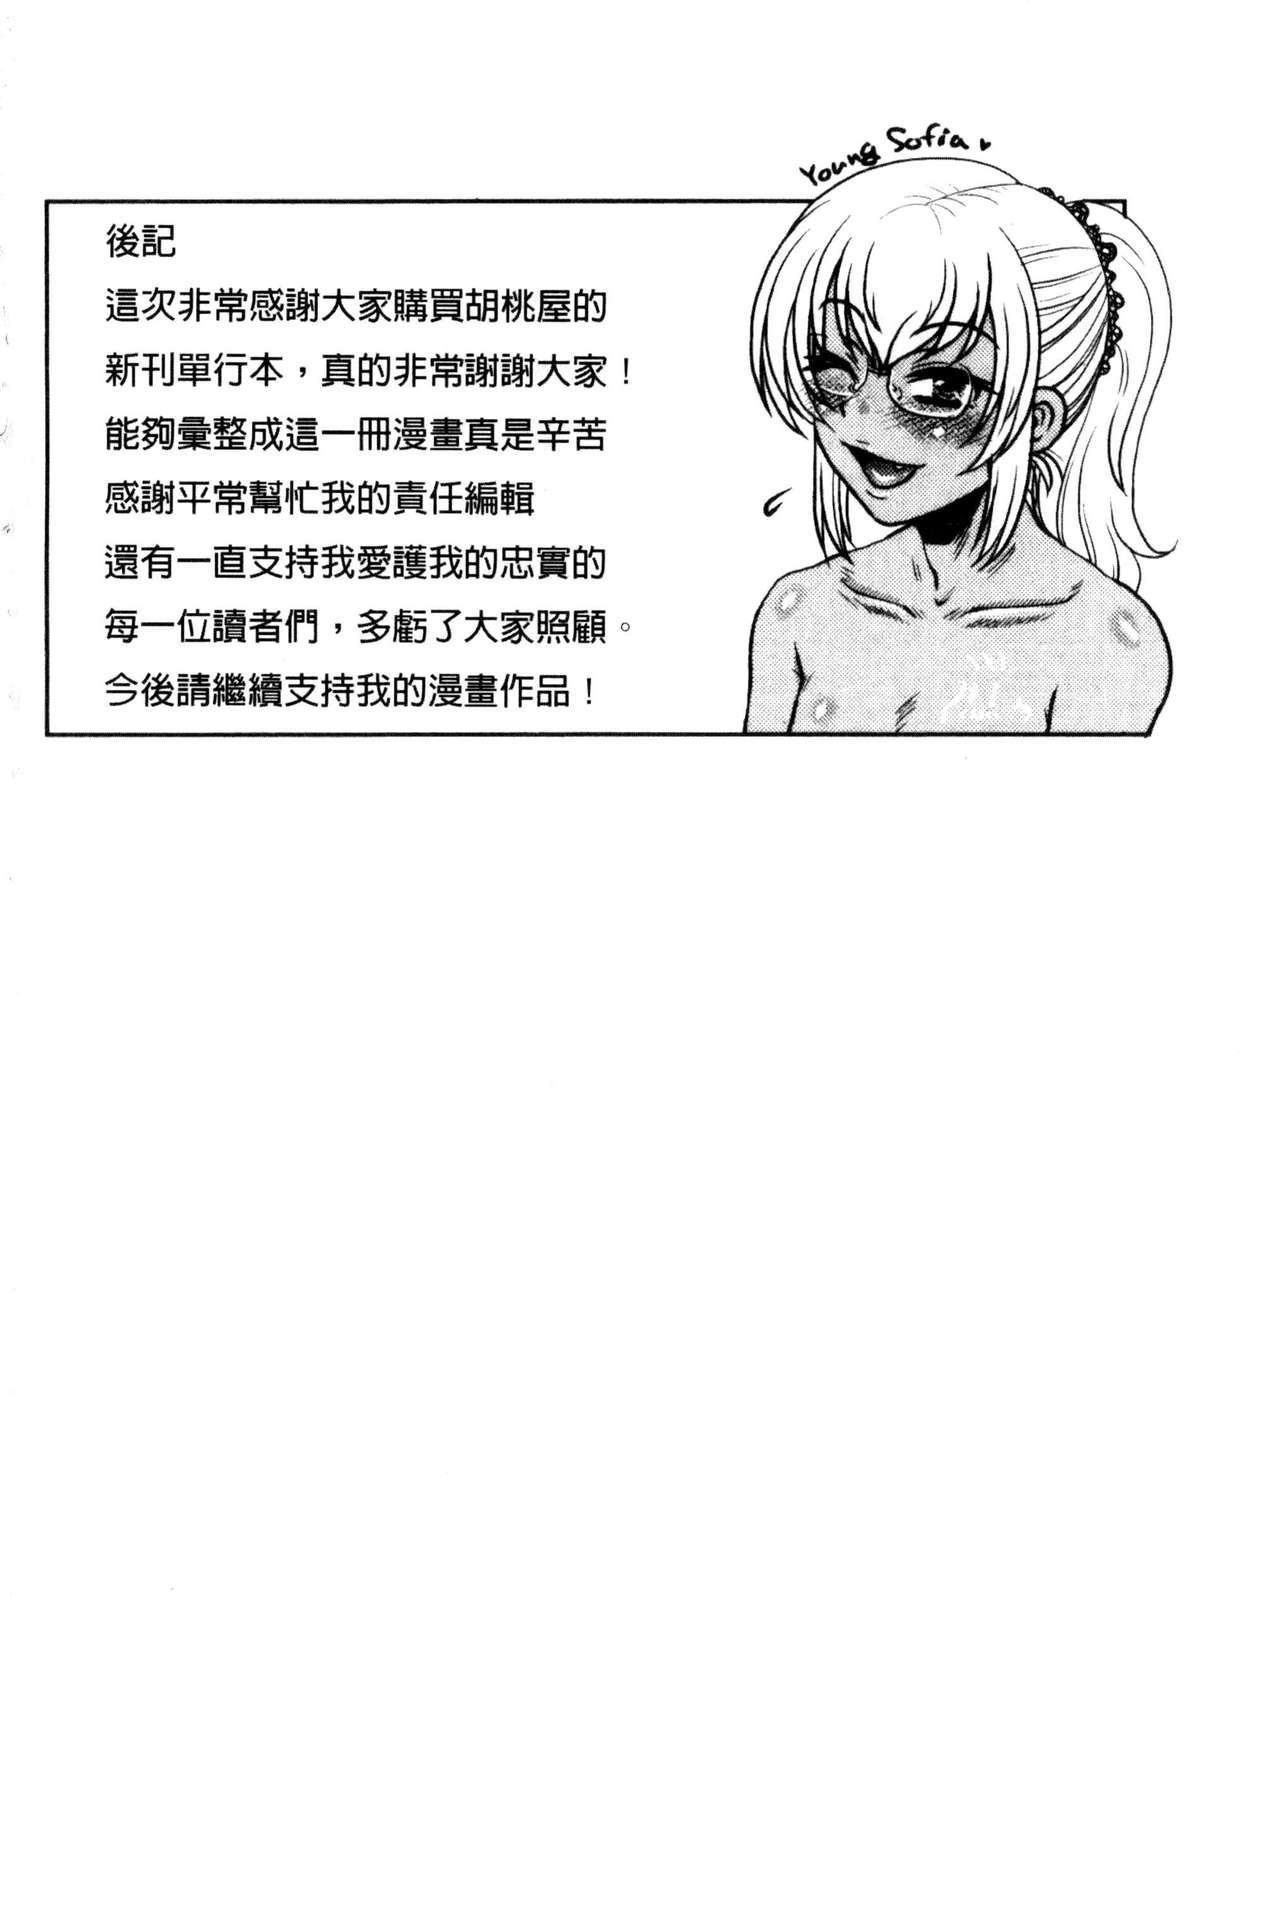 [Kurumiya Mashimin] Uchi no Shachou no Hamedere Inkatsu - Our President is HAME-DERE in Licentious sex life. [Chinese] 196